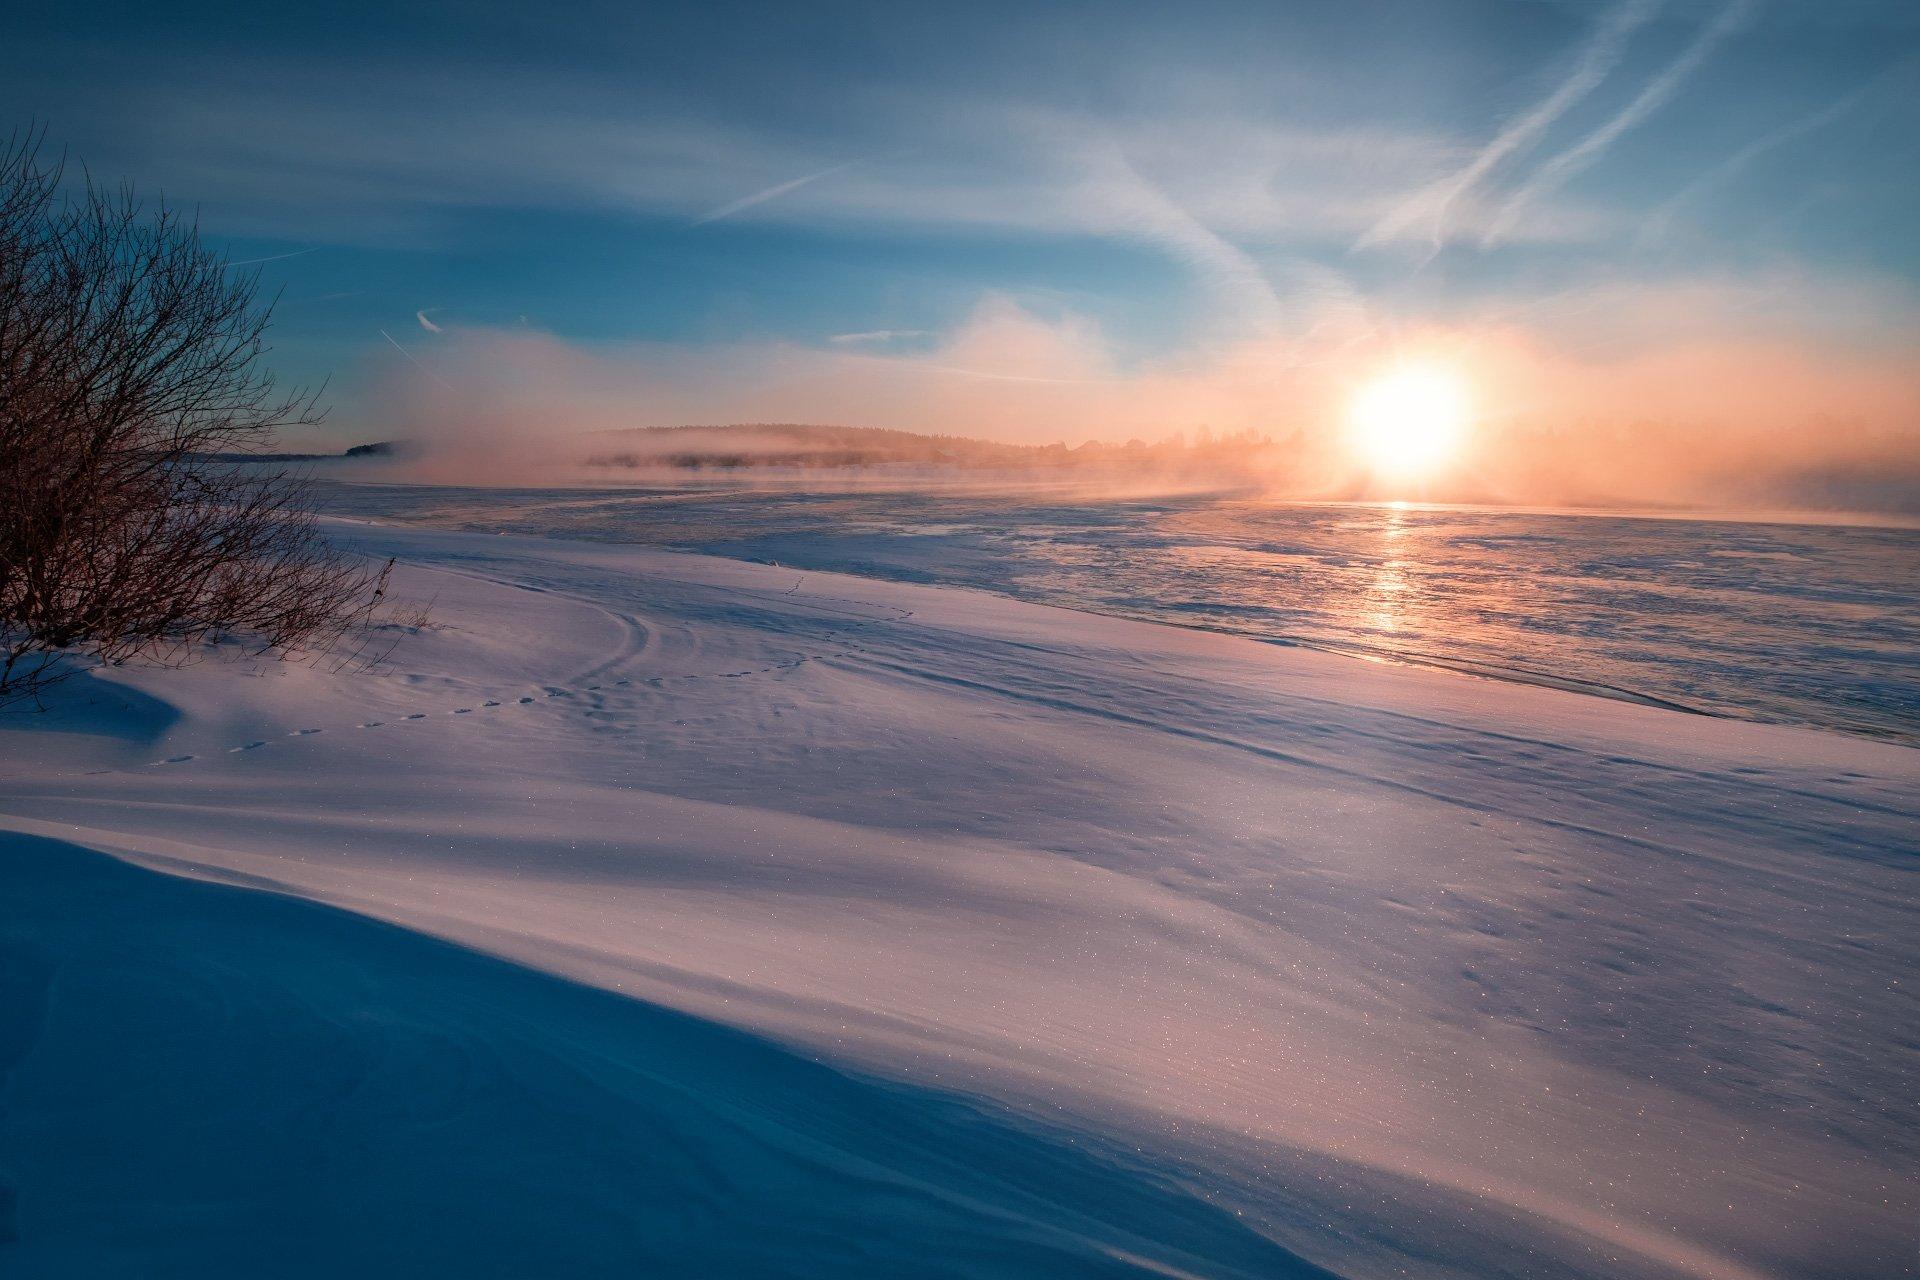 пейзаж, зима, река, туман, пар, лед, снег, утро, рассвет, восход, мороз, холод, волга, дубна, путешествие, Андрей Чиж